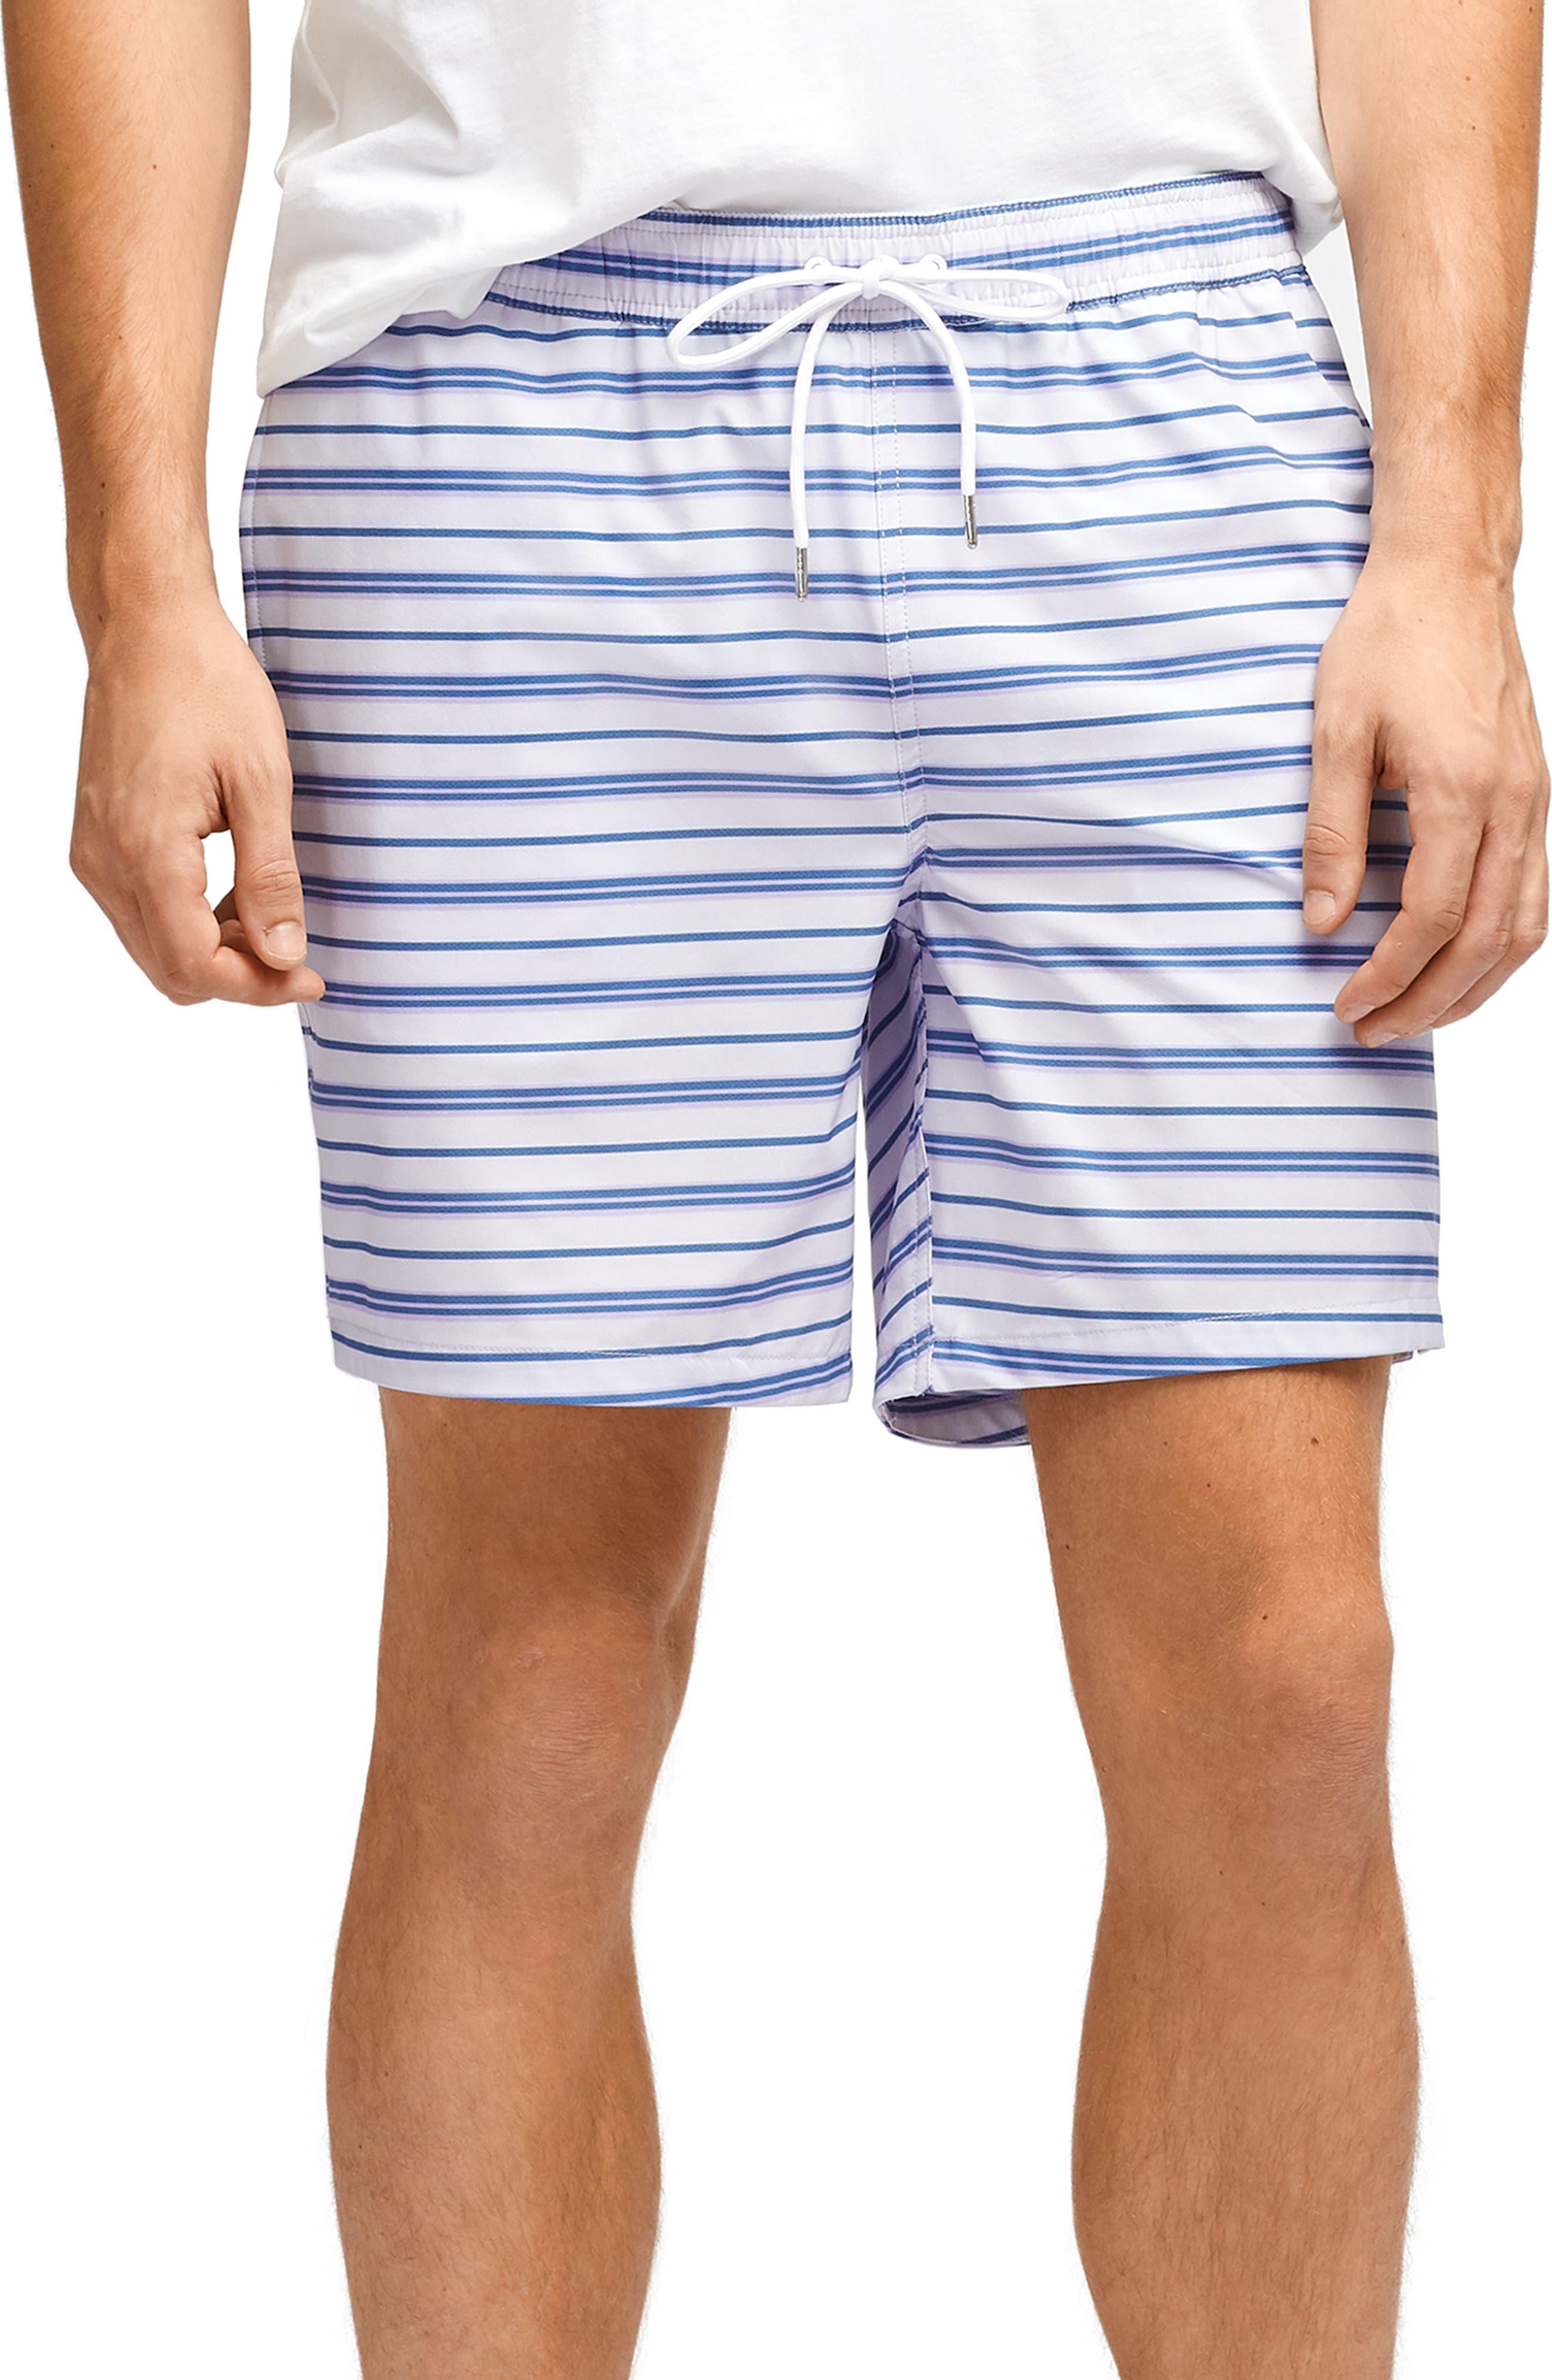 BONOBOS Banzai 7-Inch Stripe E-Waist Swim Trunks, Main, color, PURPLE STRIPE